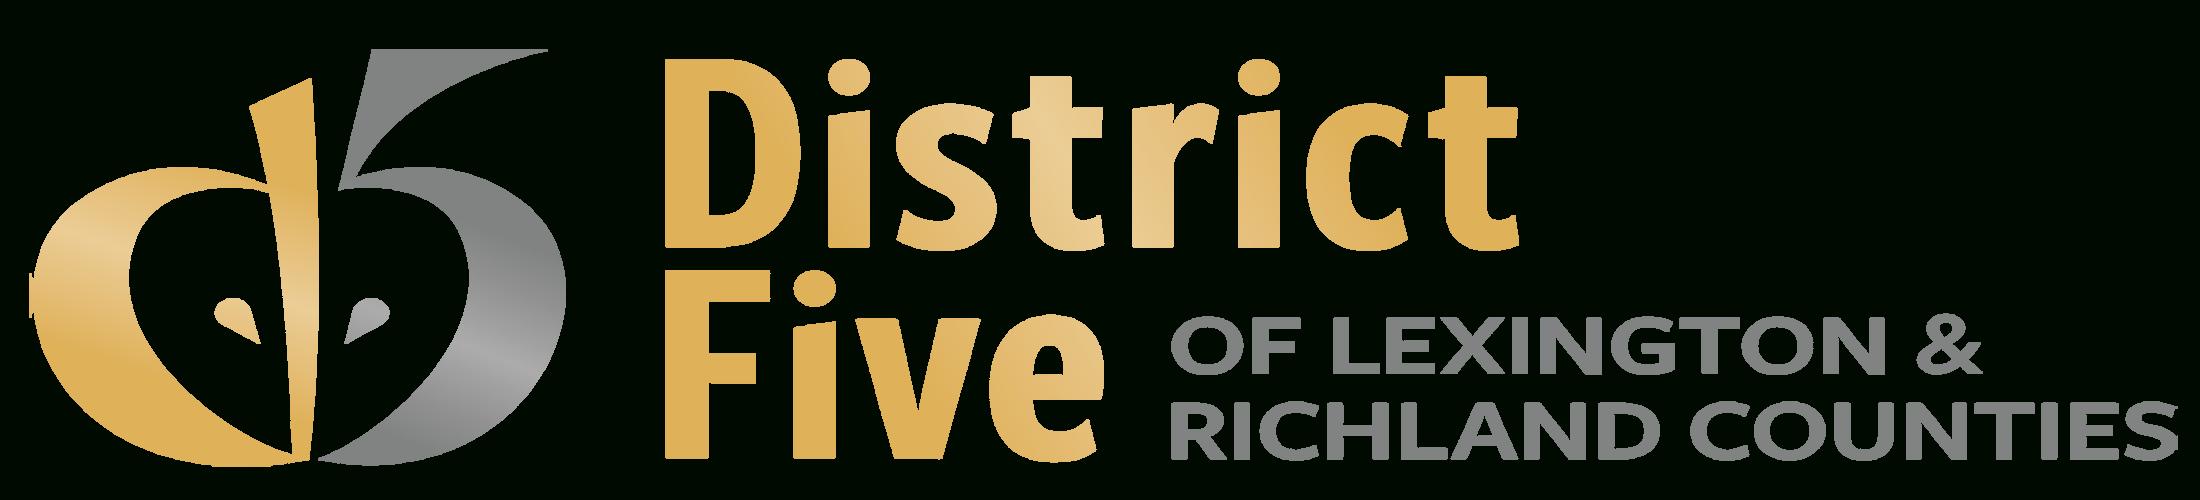 Lexington Richland School District 5 / Homepage Throughout Lex Dist 1 Calendar